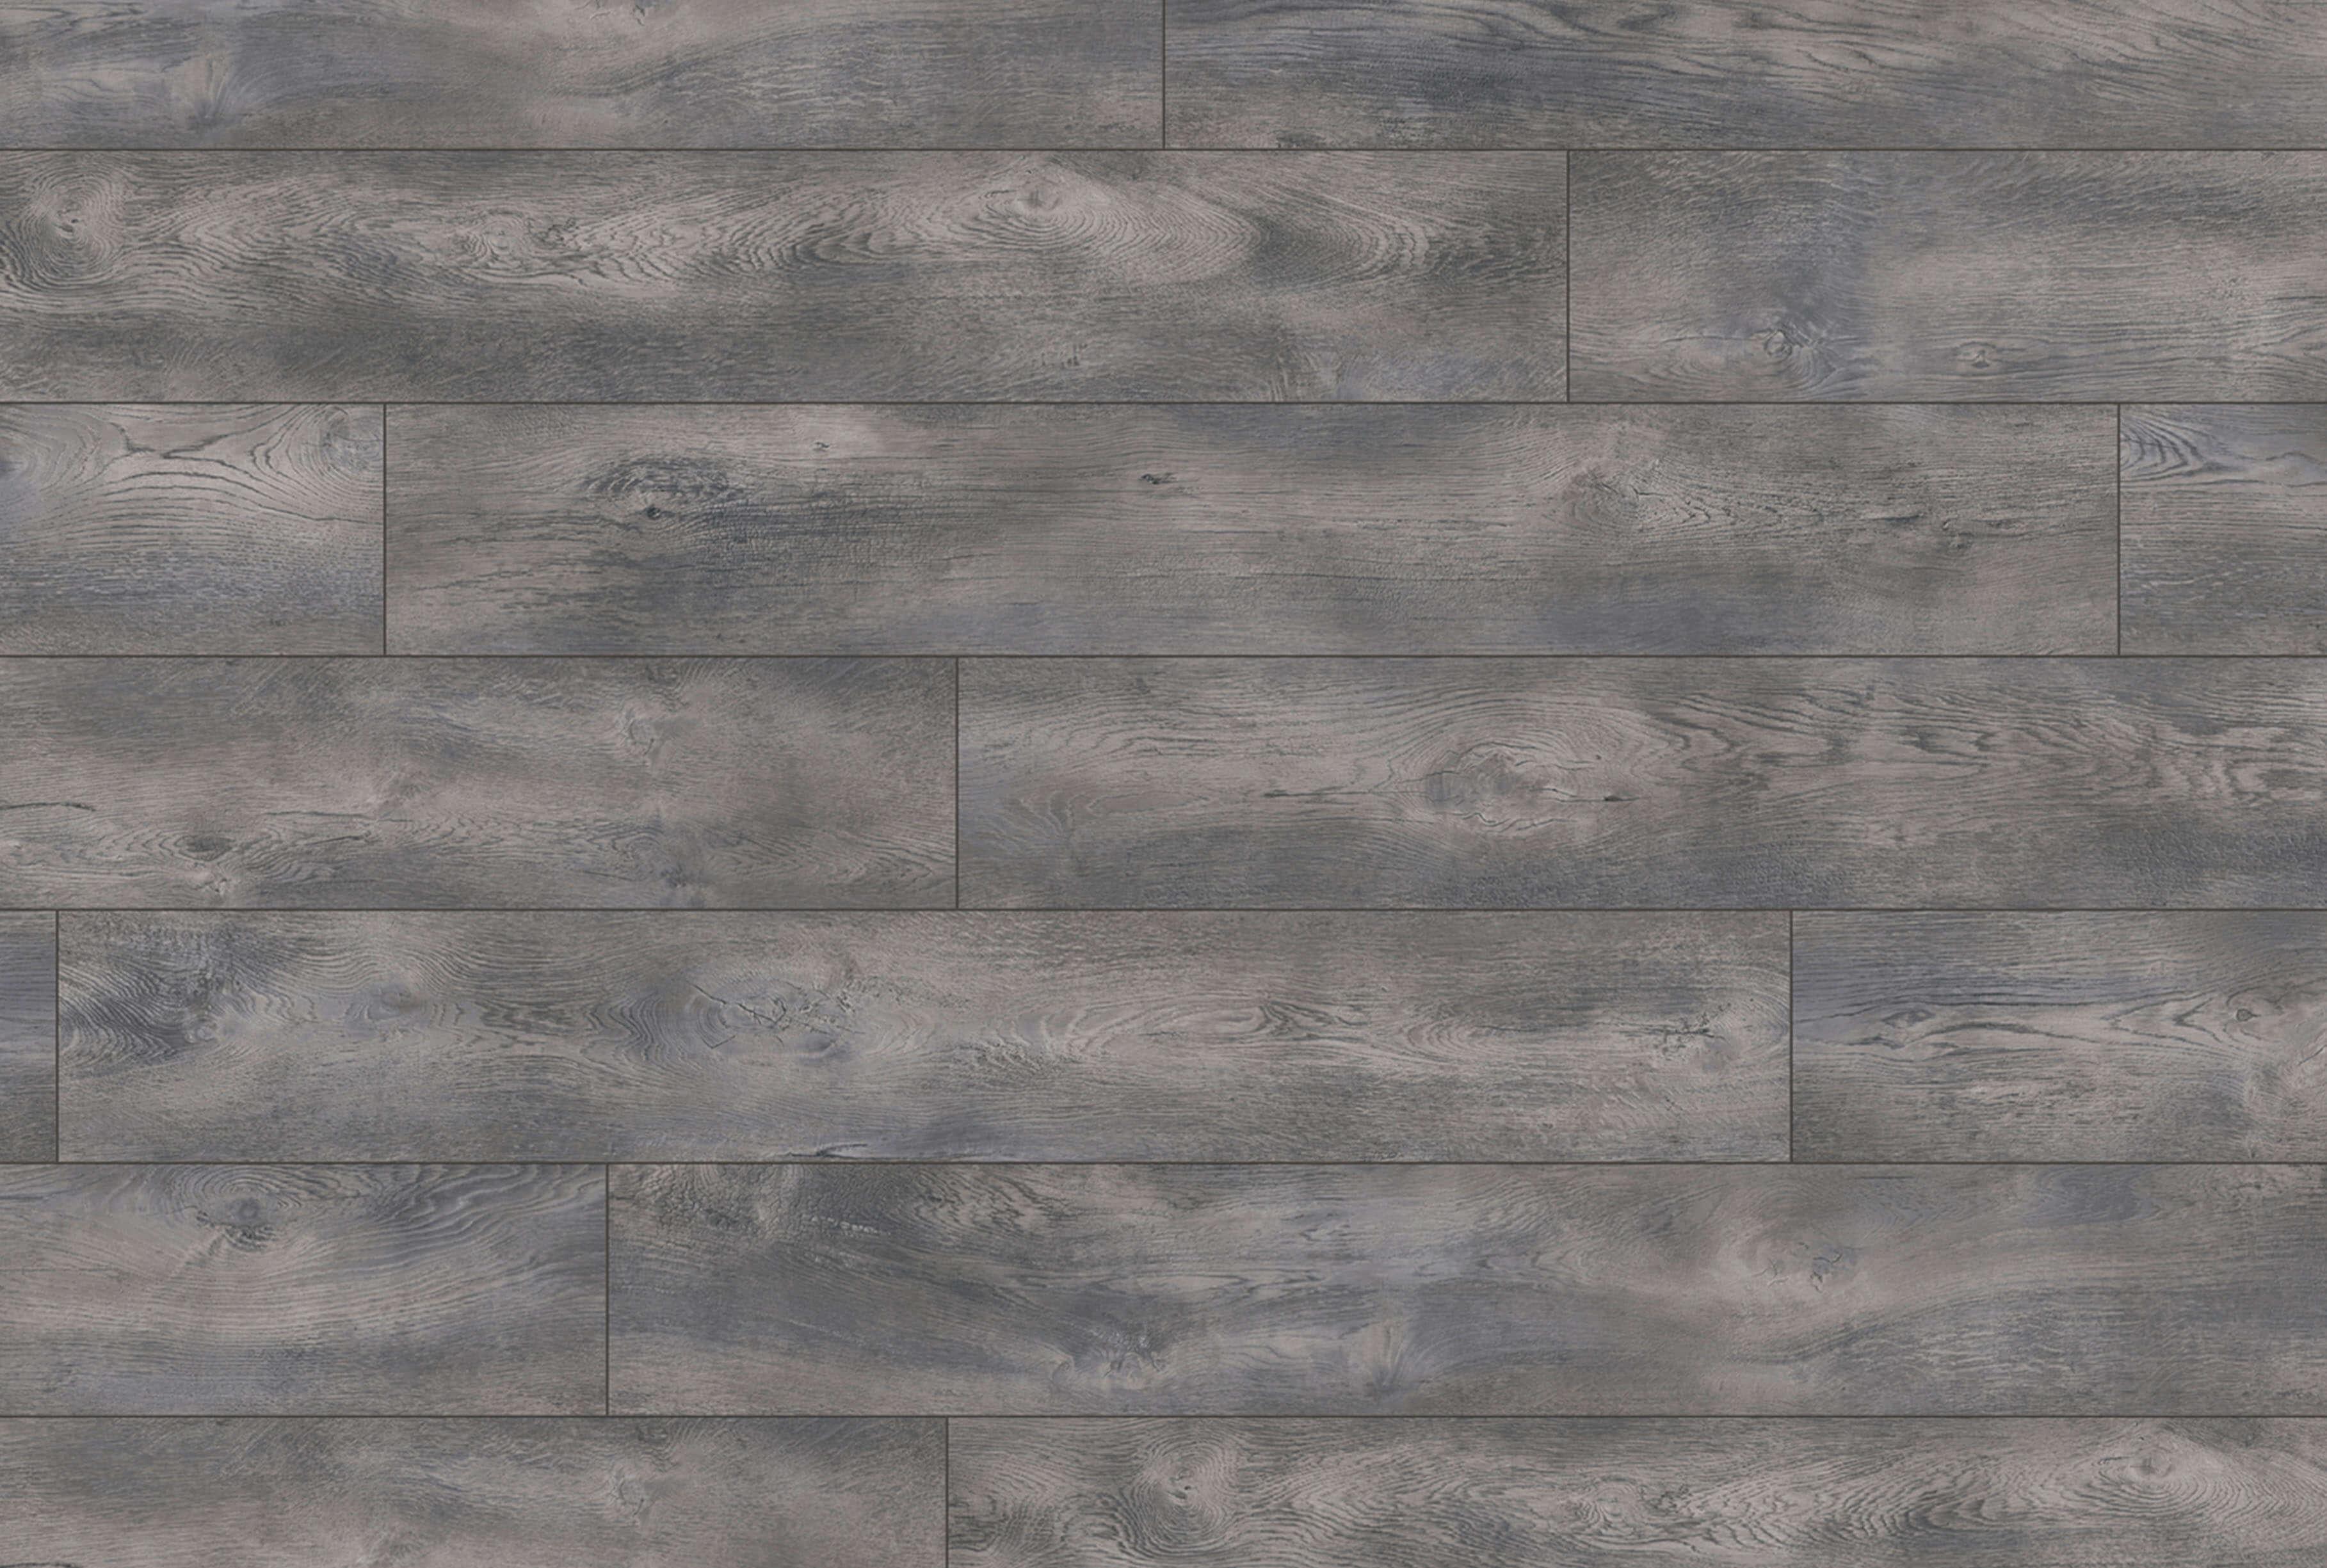 1537 · Vancouver Oak<br>Format size: W 192 mm x L 1285 mm<br>Structure: Rust